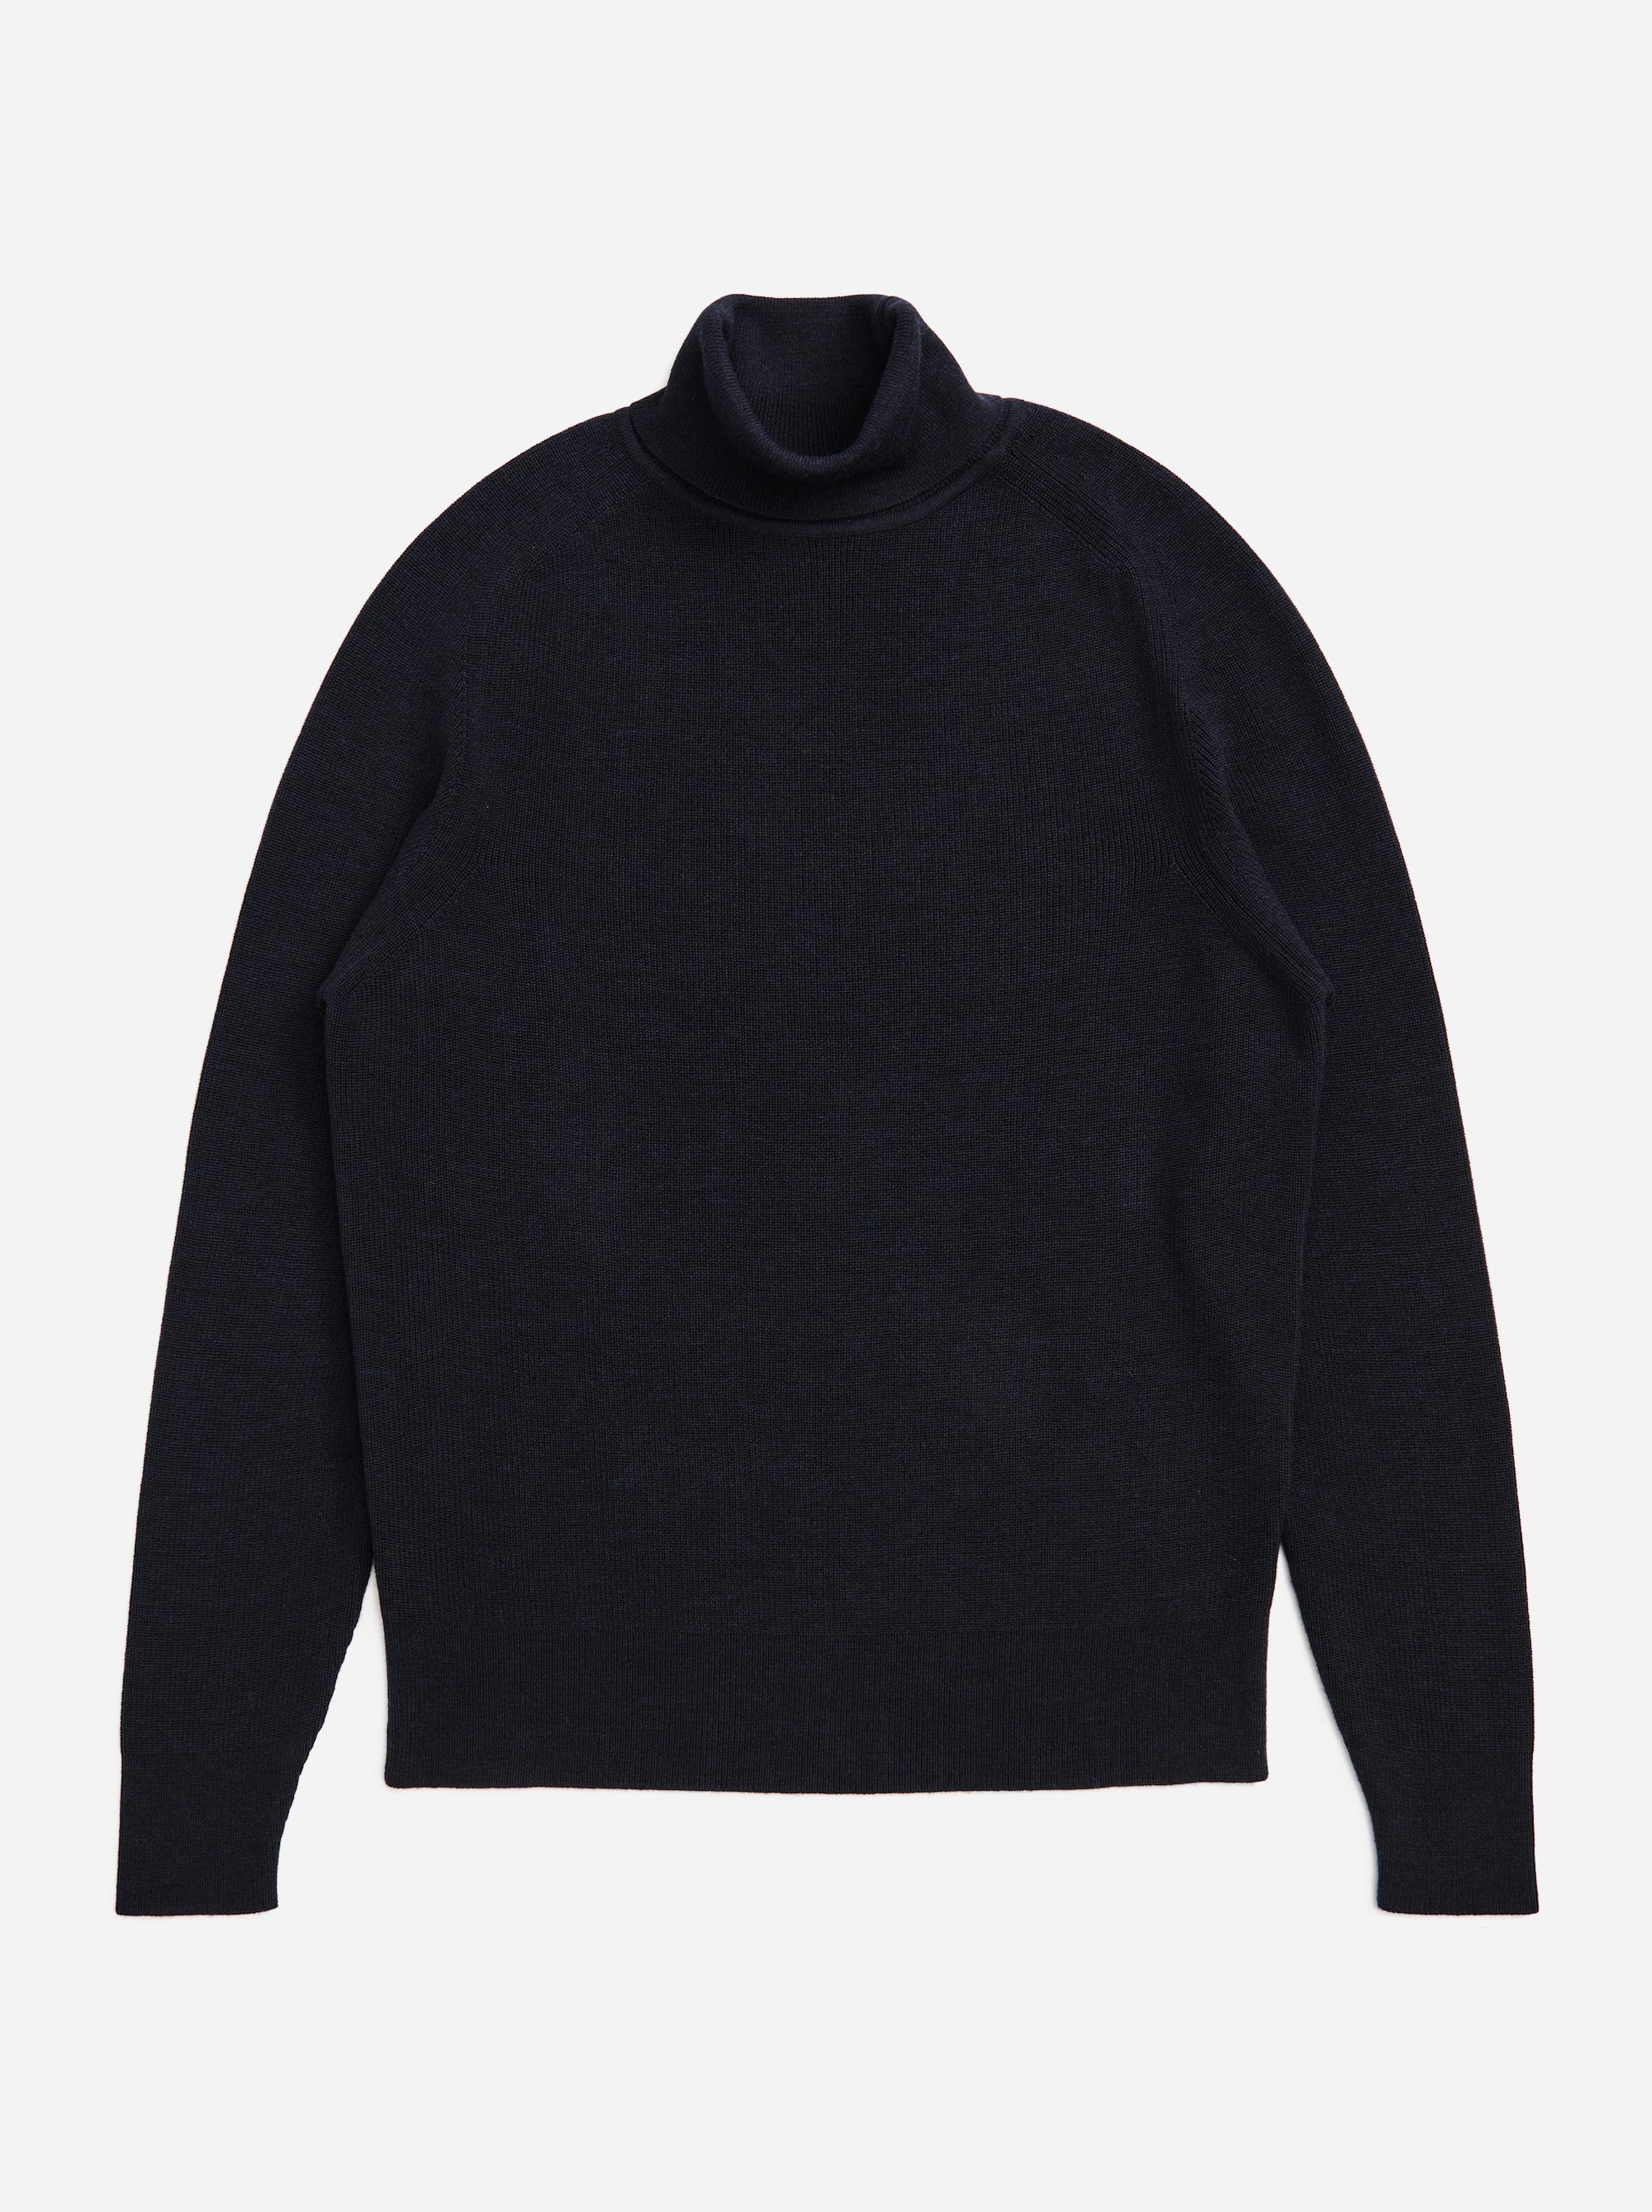 Teym - Turtleneck - The Merino Sweater - Men - Blue - 5